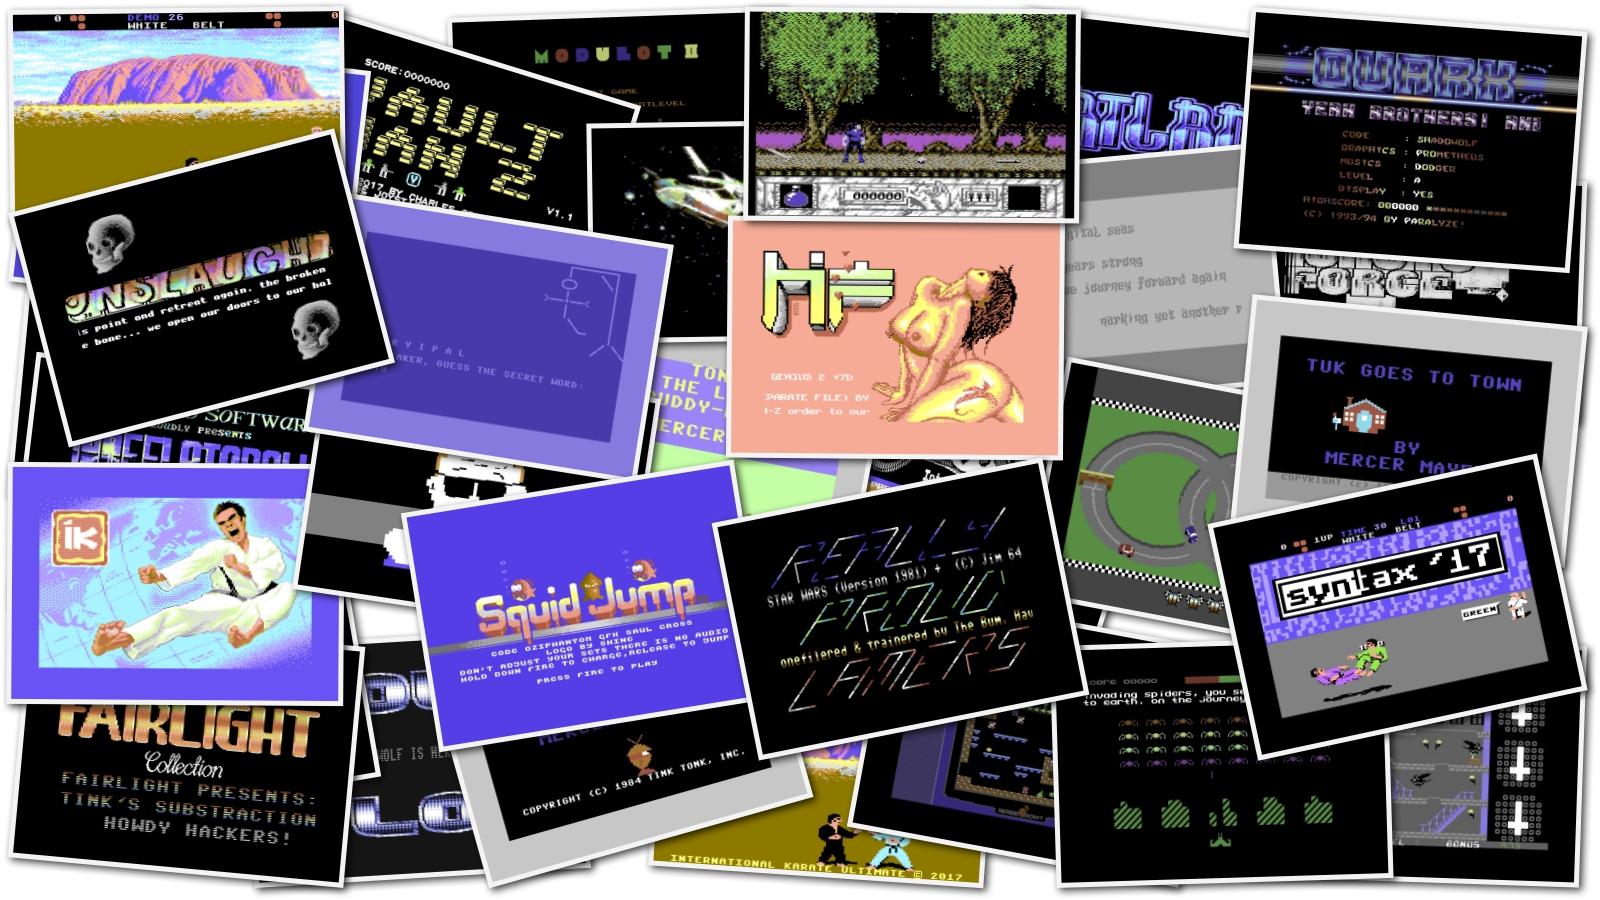 C64 Big Game Pack | nIGHTFALL Blog / RetroComputerMania com - Part 2